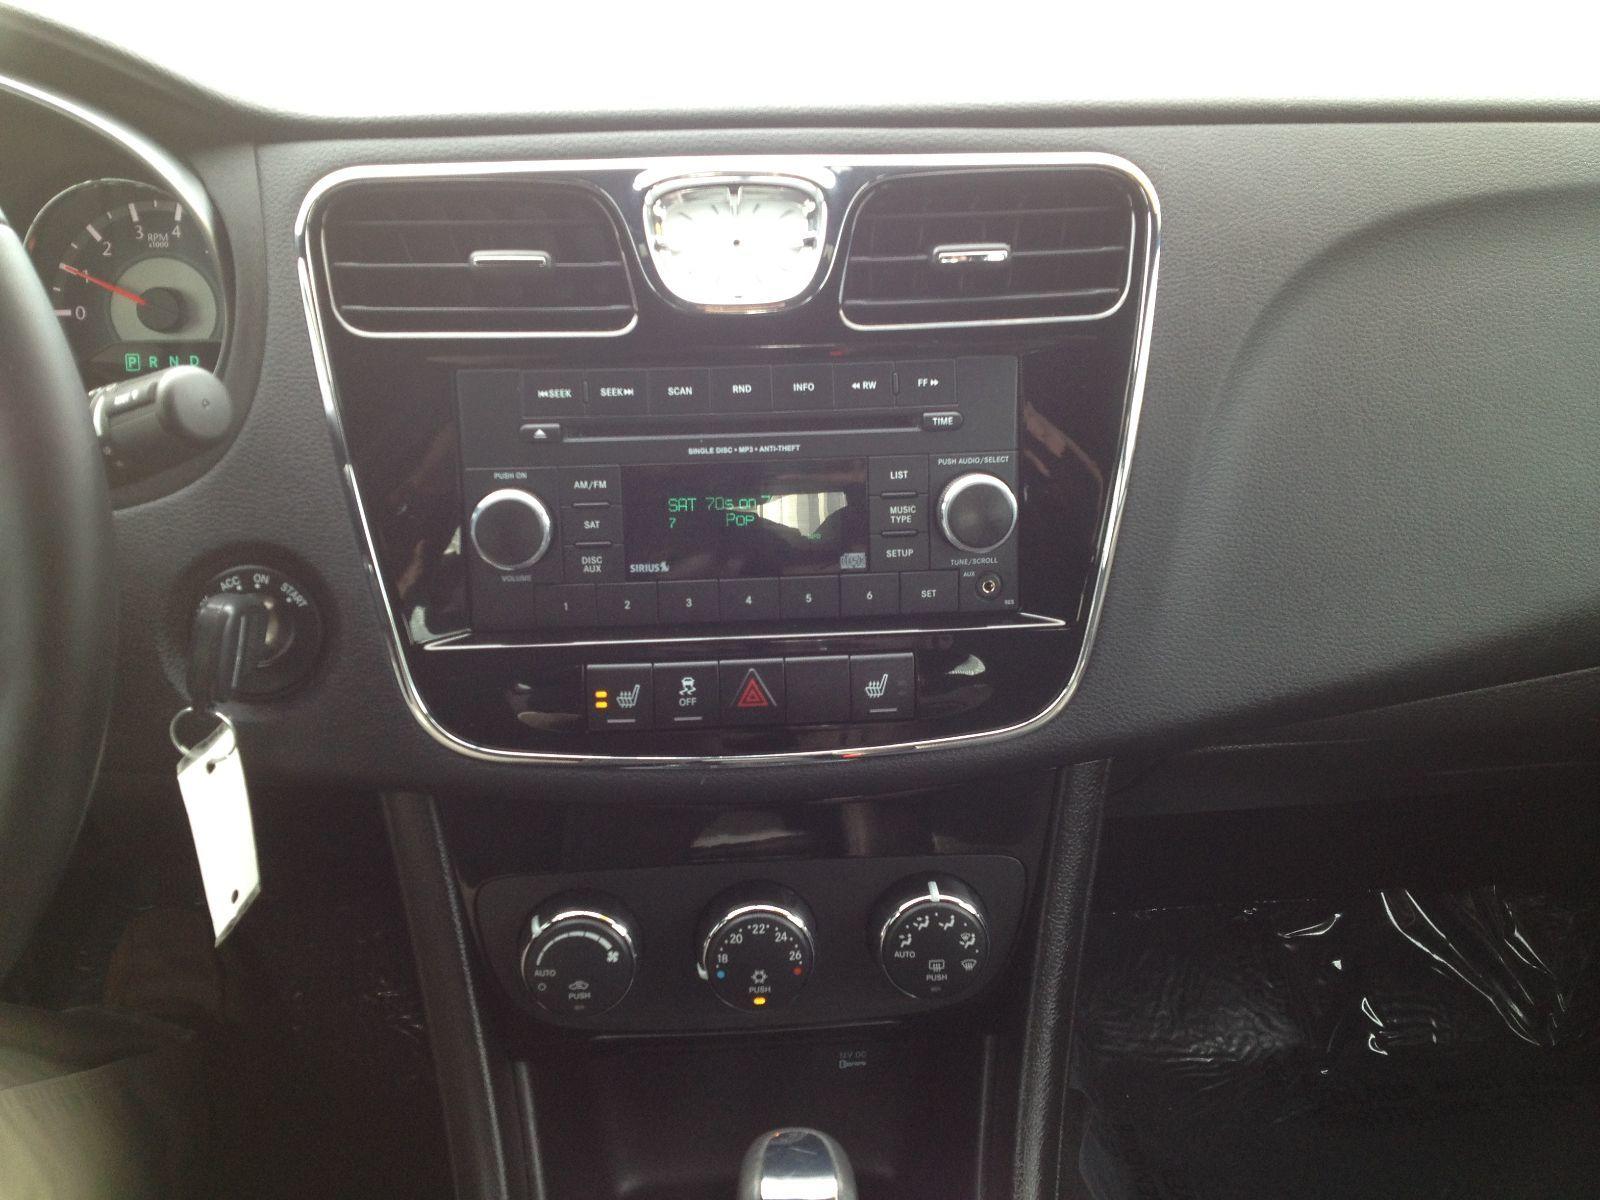 Chrysler 200: CD Player